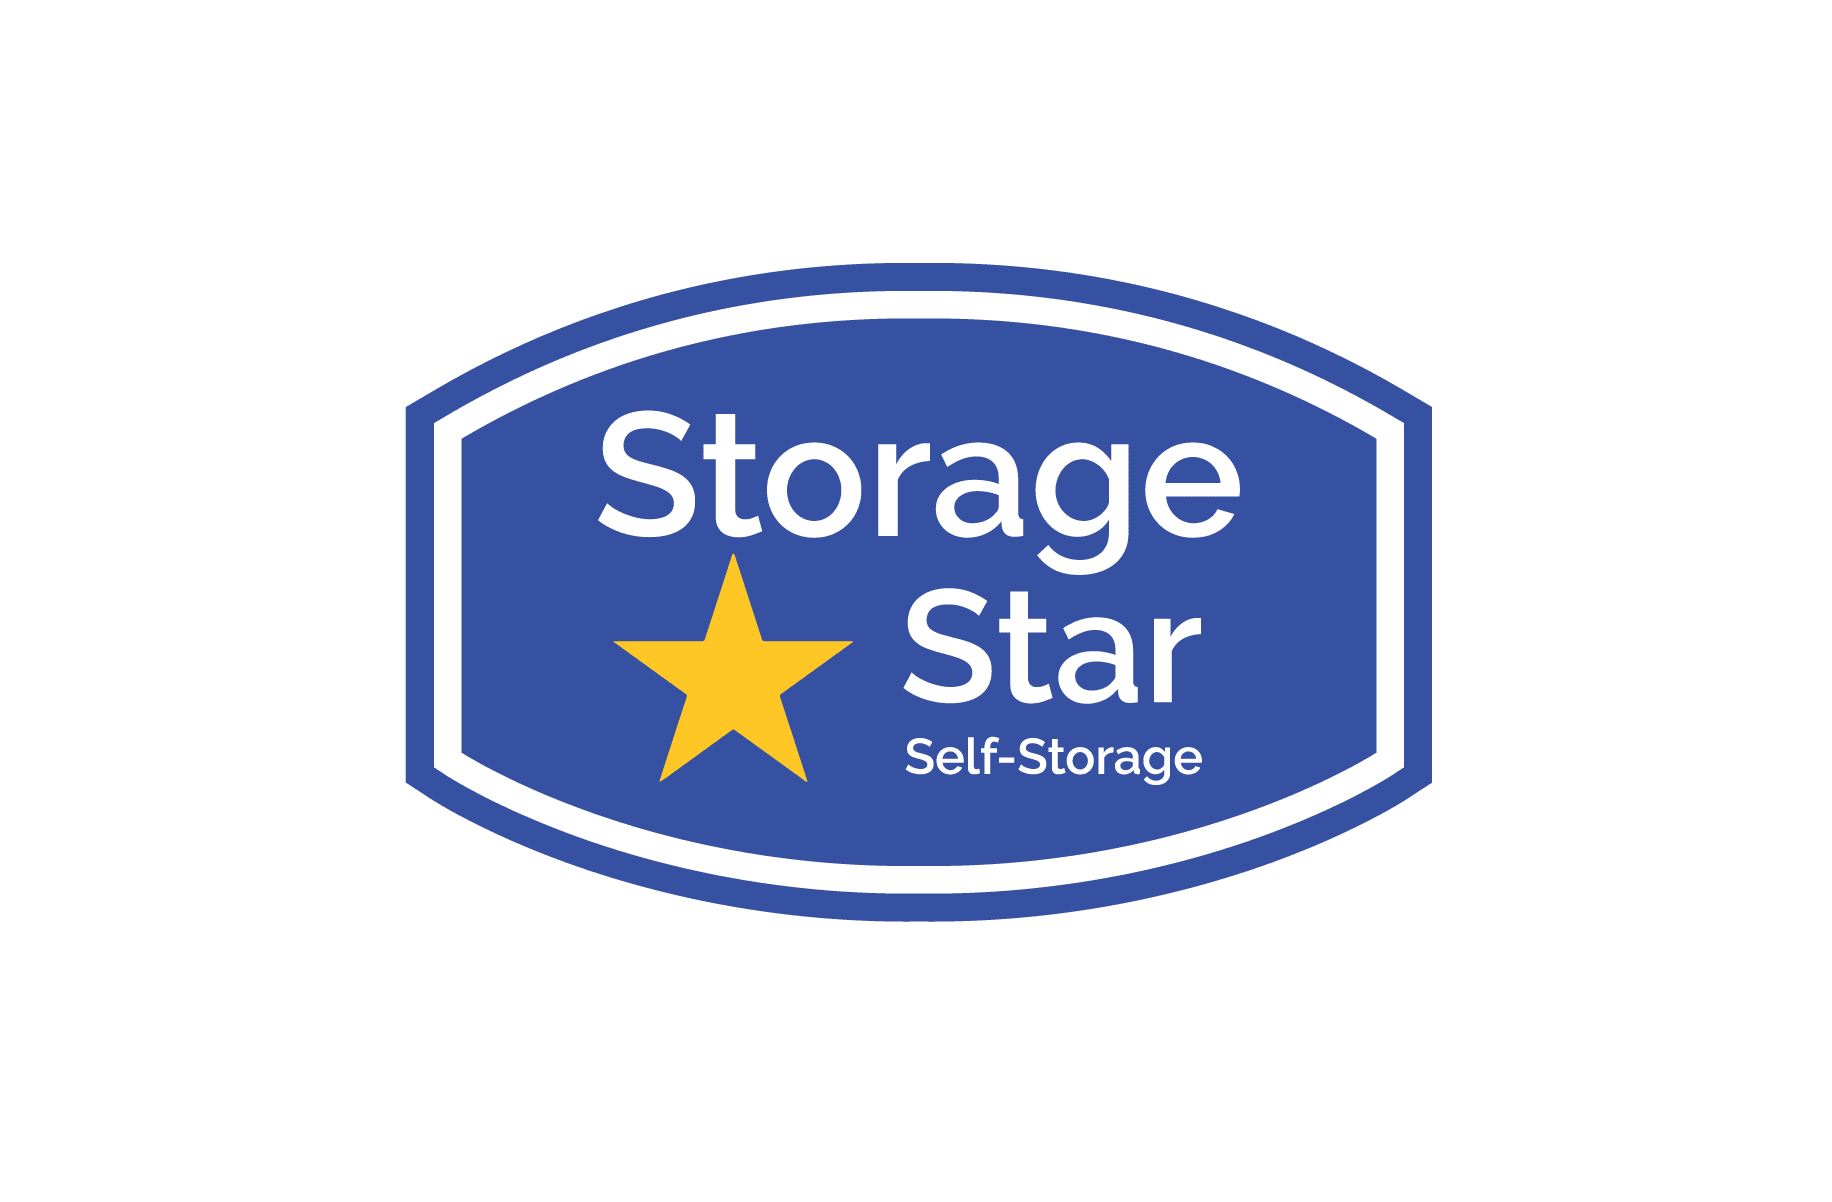 Storage Star Fairfield in Fairfield, California logo